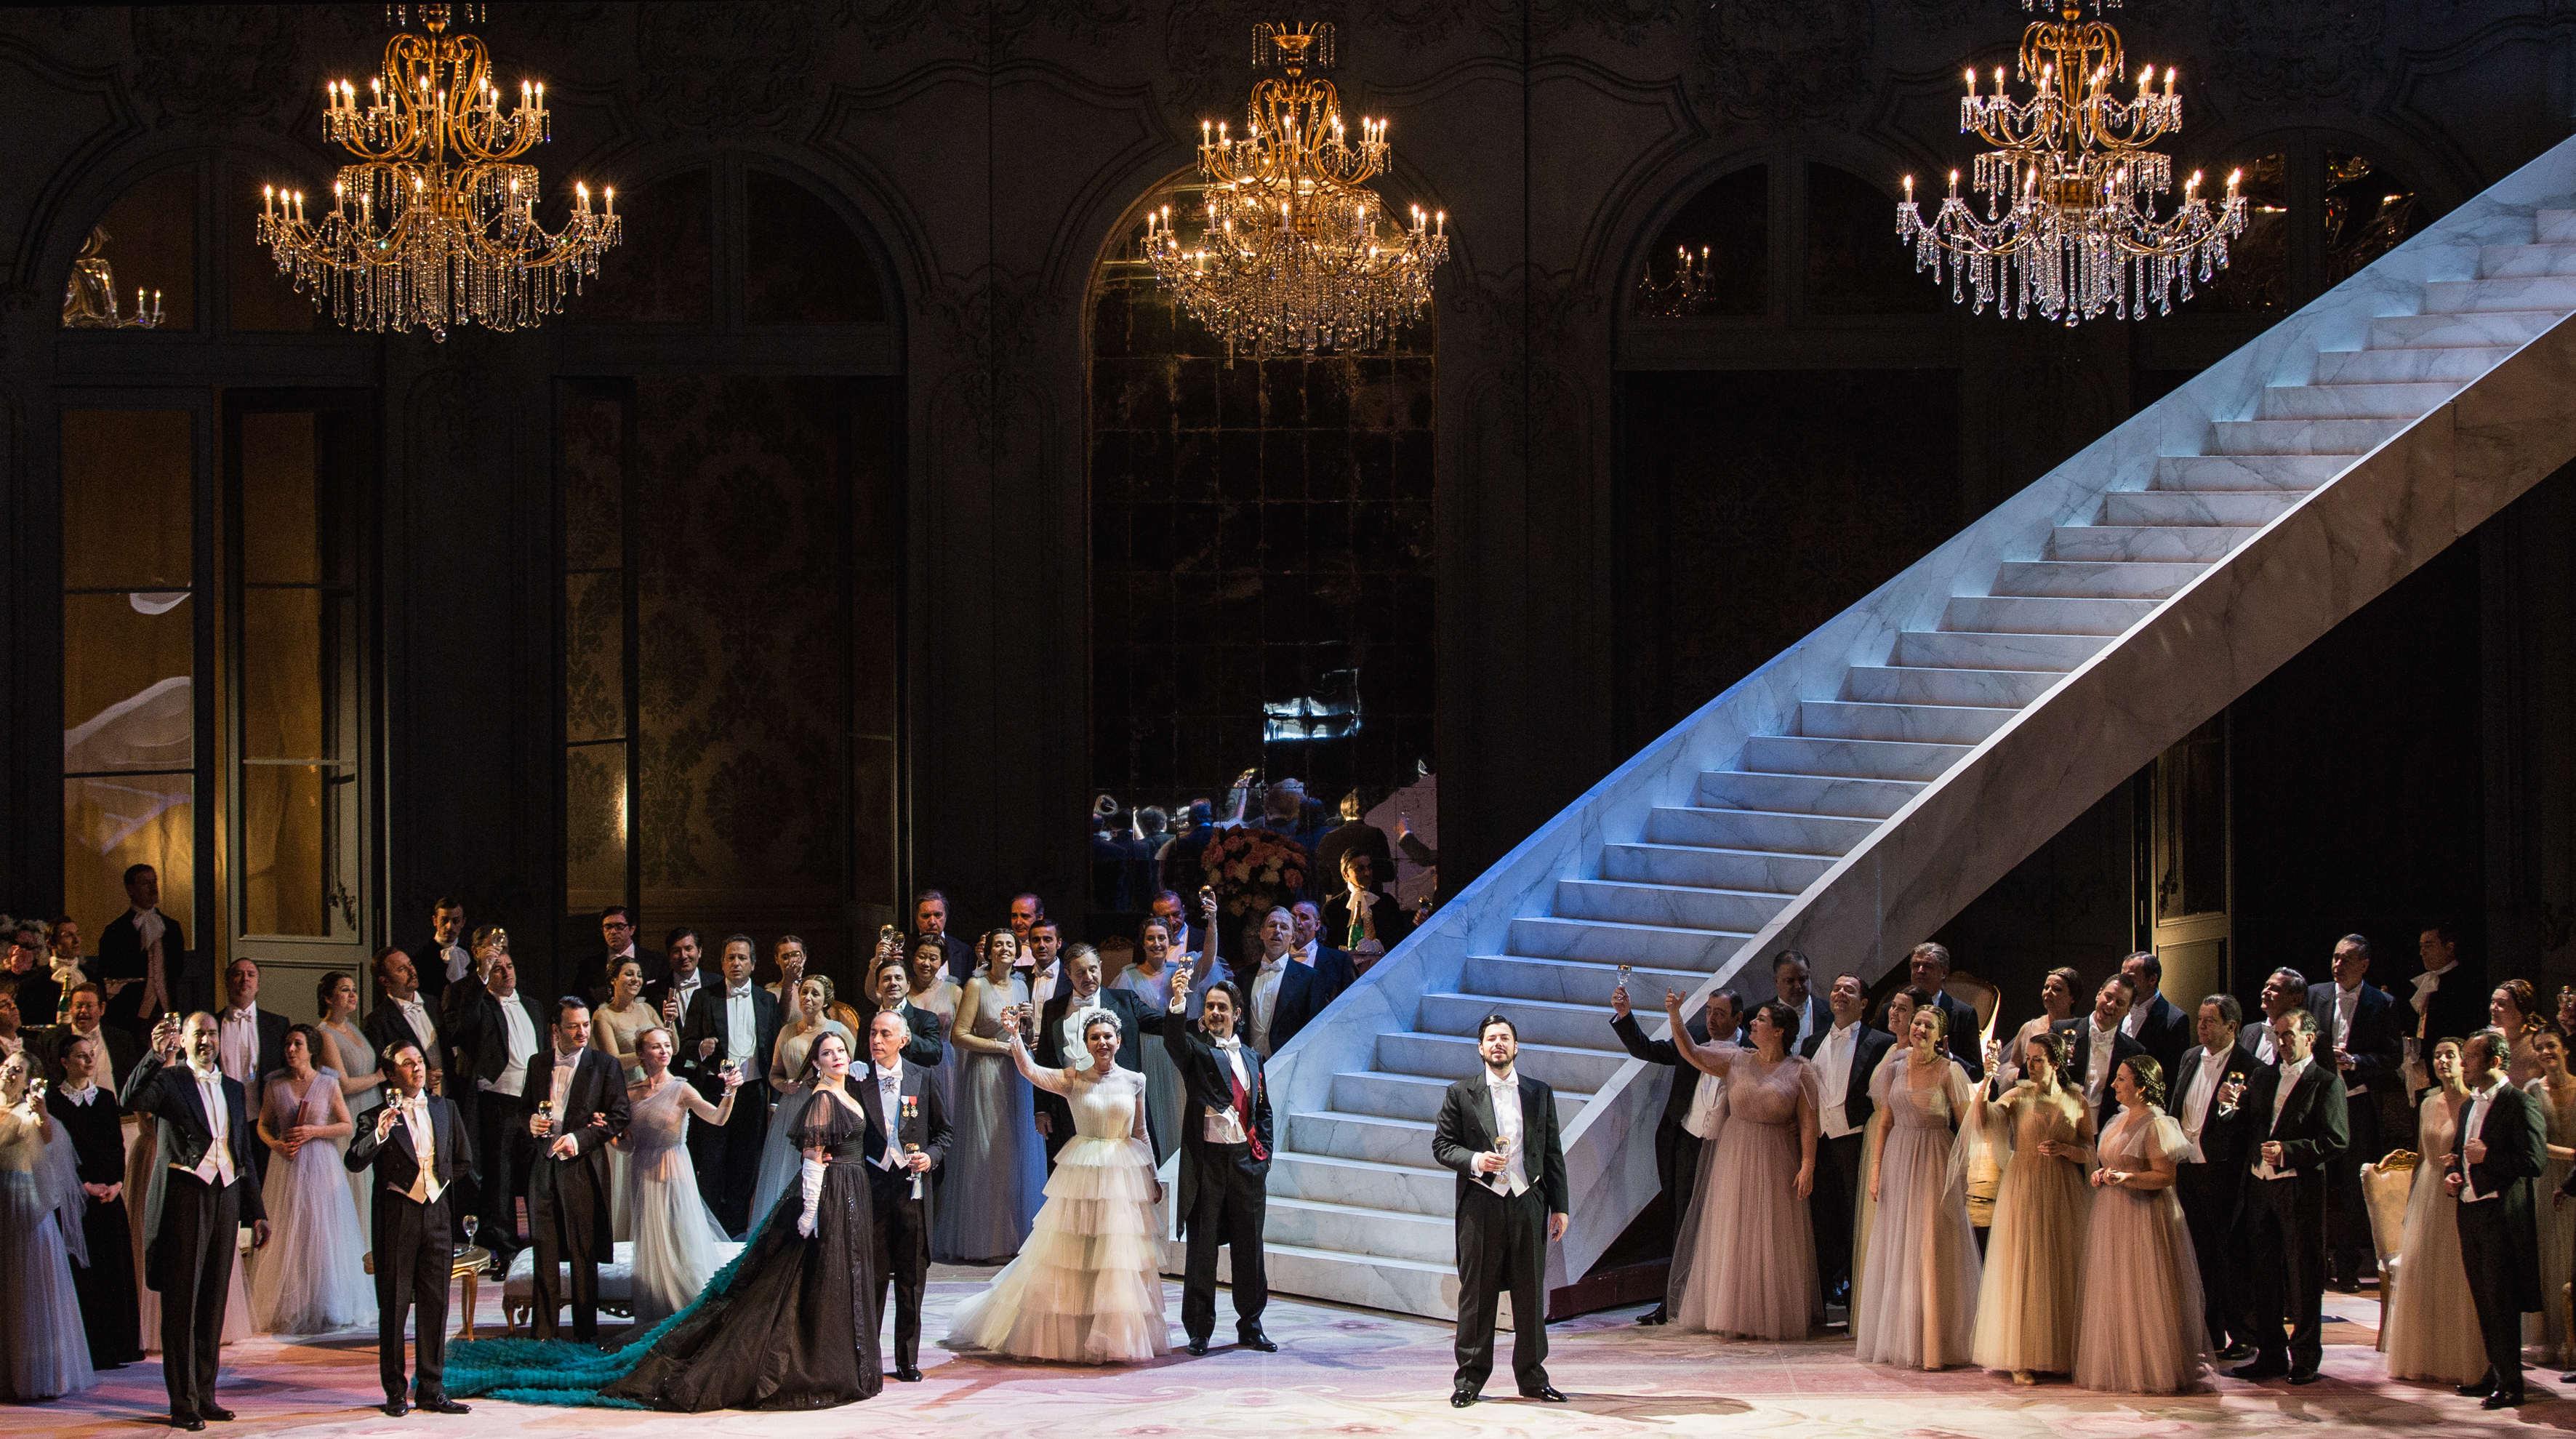 la-traviata atto-i-un-totaleyasuko-kageyama-opera-di-roma-2015-16 1923